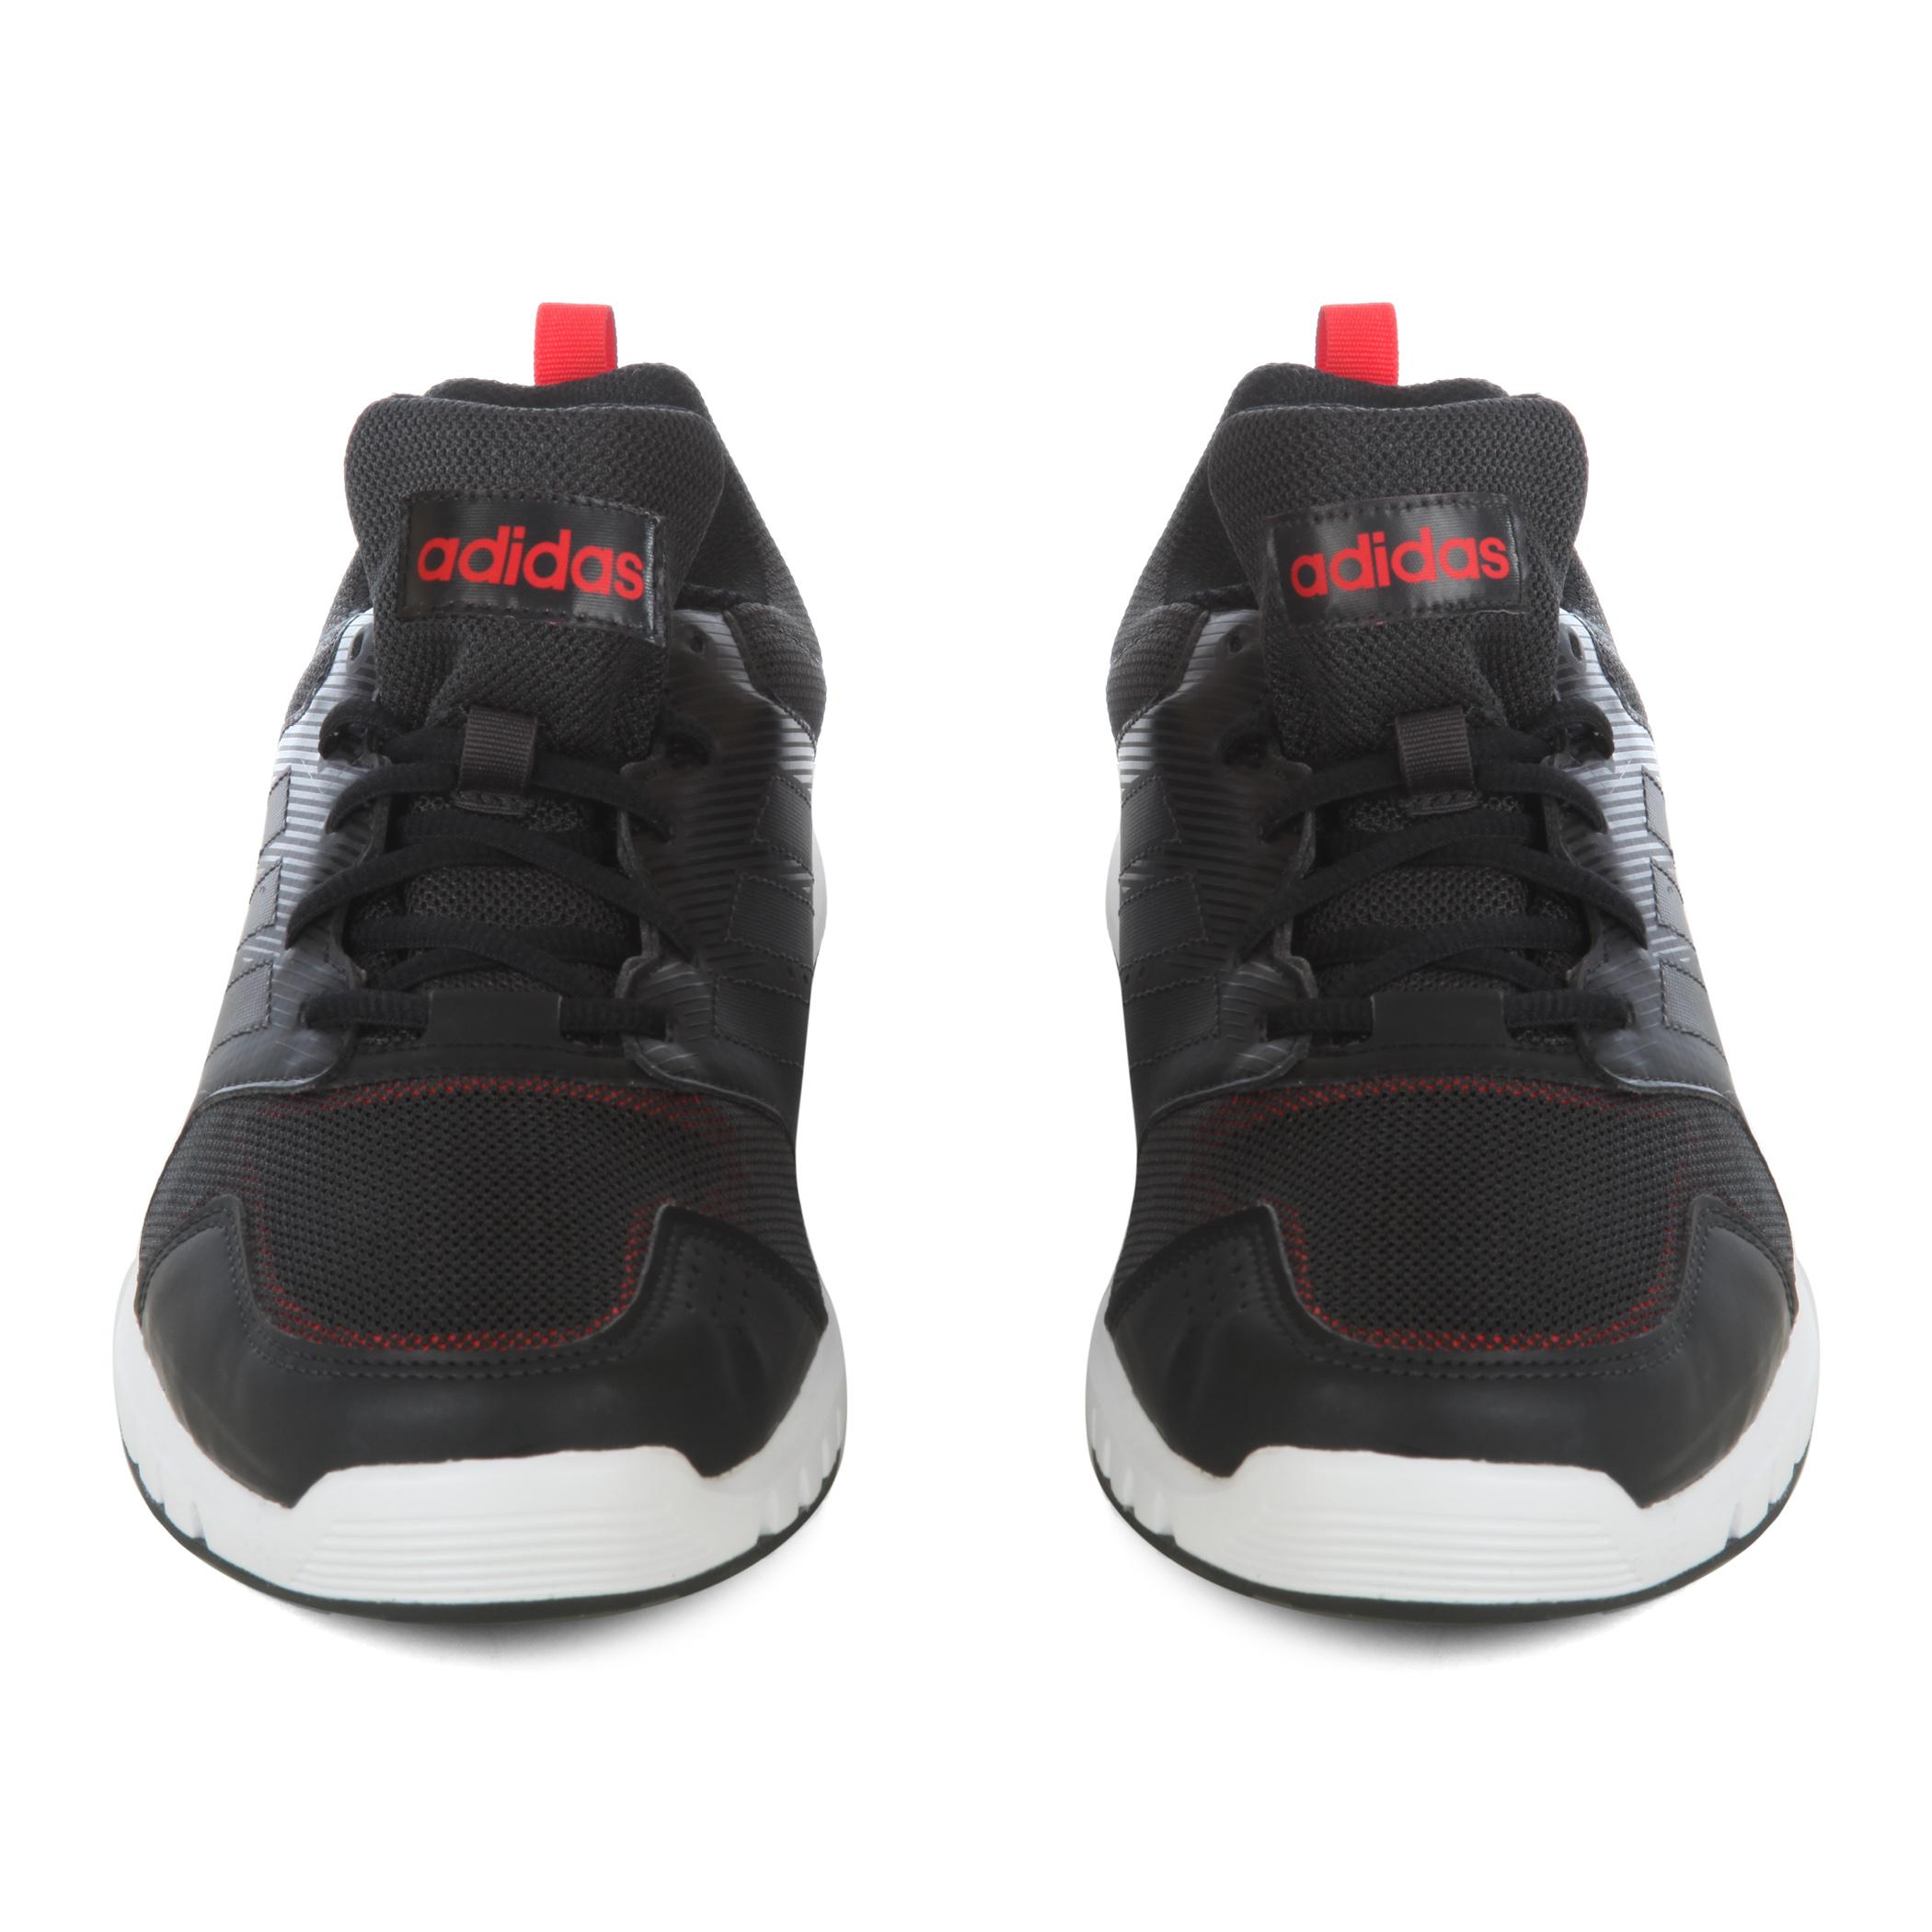 timeless design 5e2de 9a7f6 Мужские кроссовки adidas Performance Essential Star 3 CarbonCore Black -  фото 3